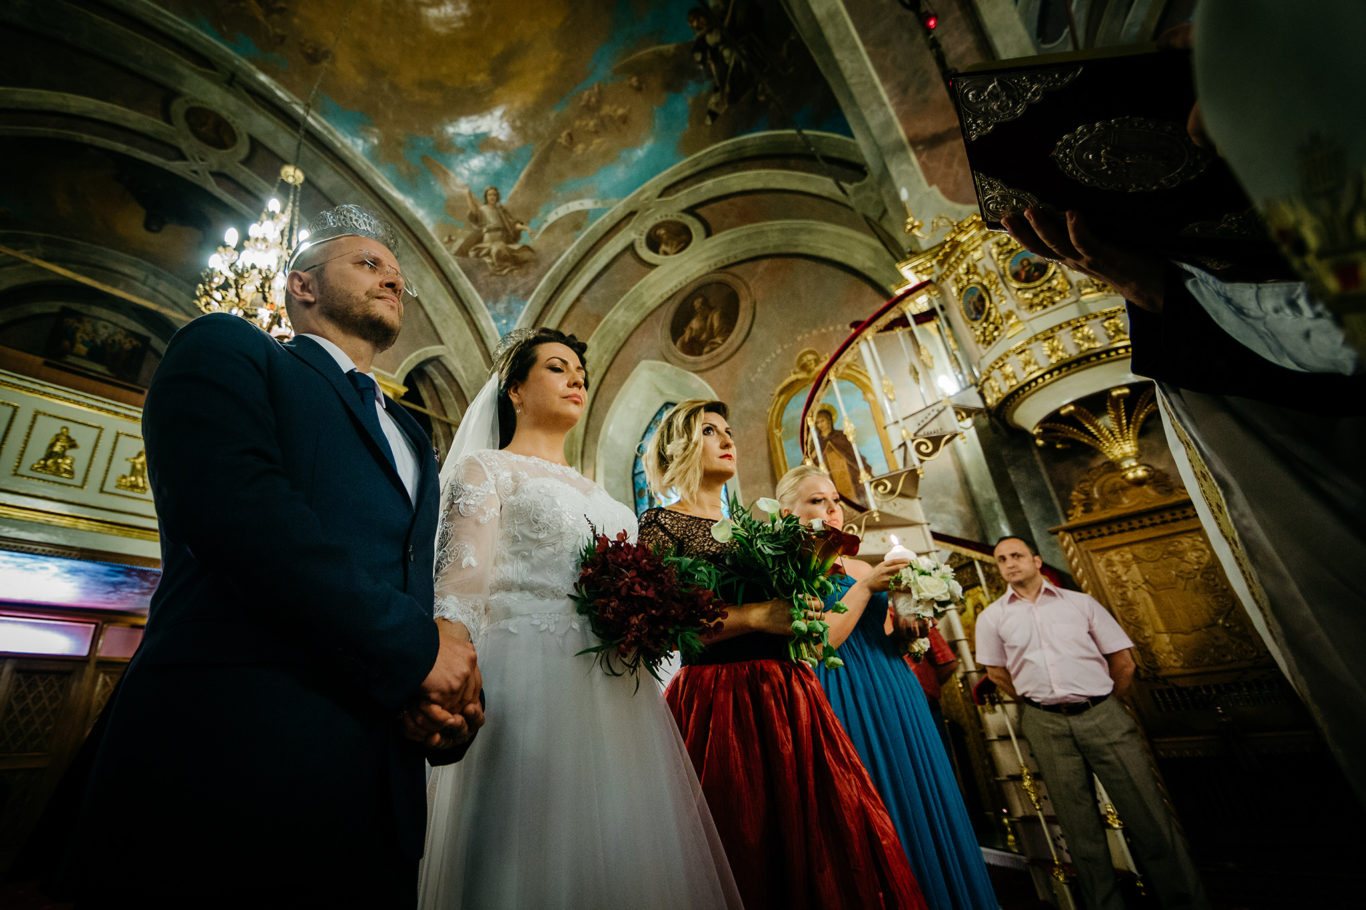 0402-fotografie-nunta-bucuresti-anca-george-fotograf-ciprian-dumitrescu-cdf_0164-3